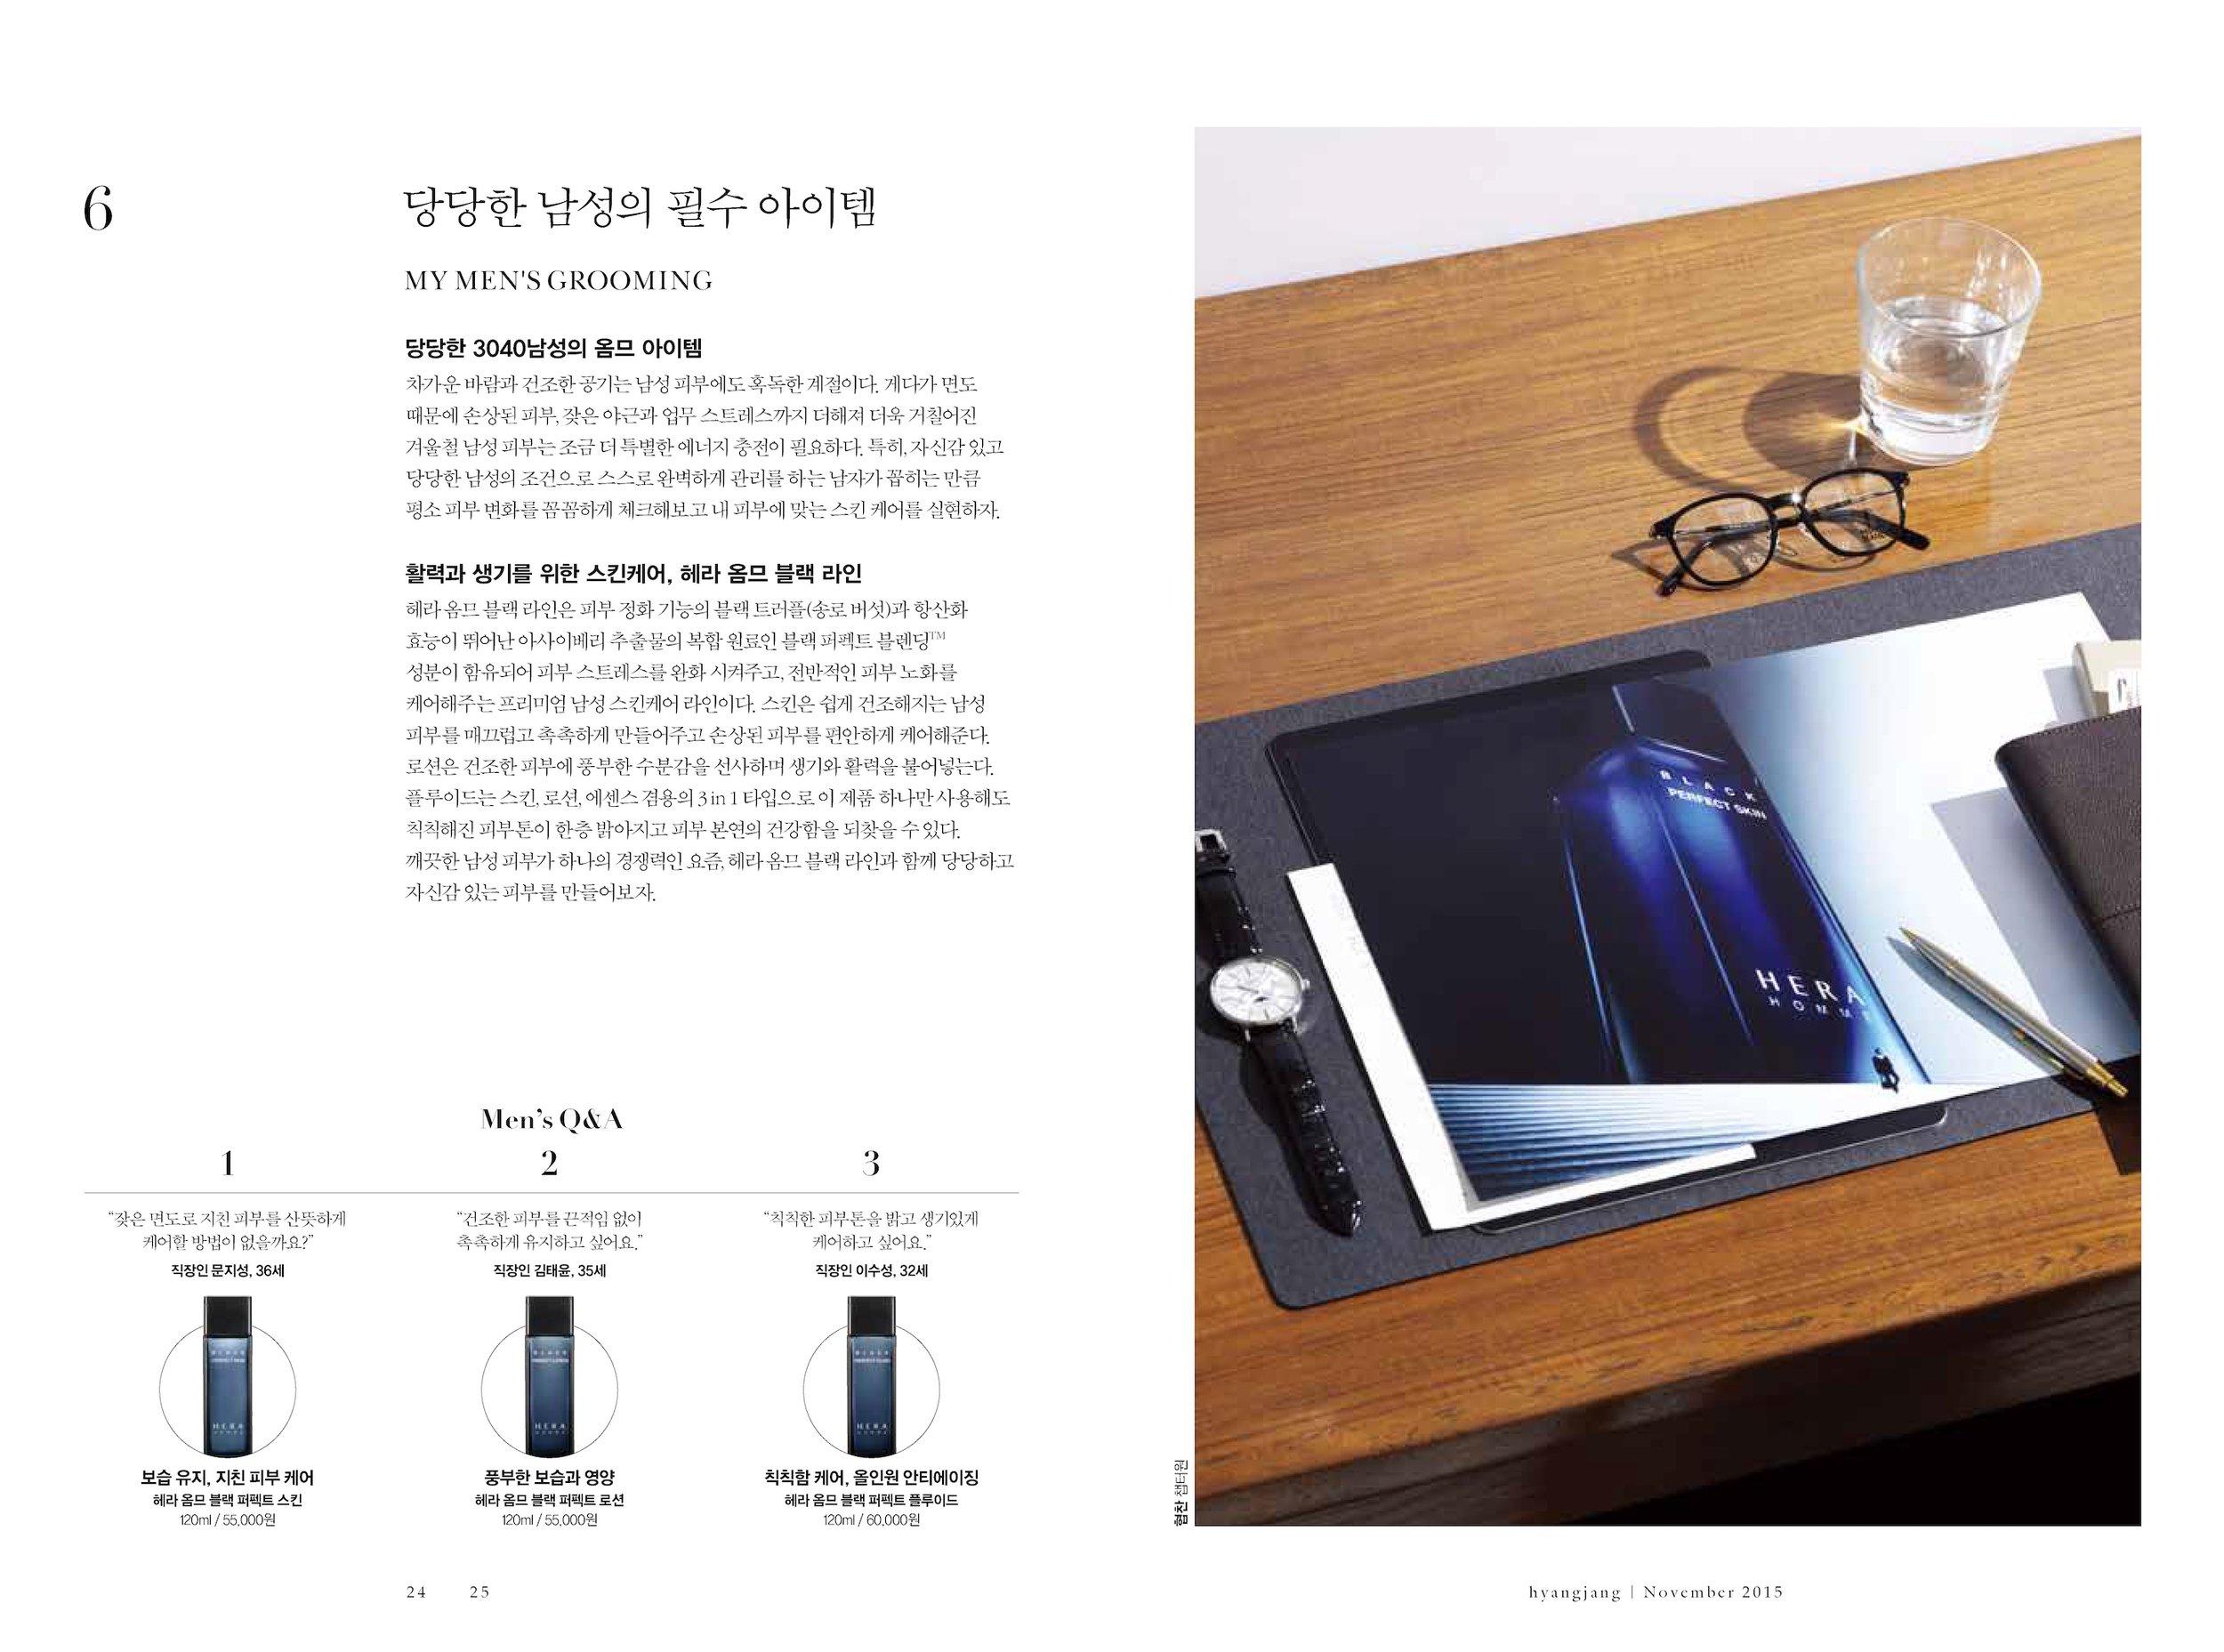 hyangjang-201511_페이지_12.jpeg